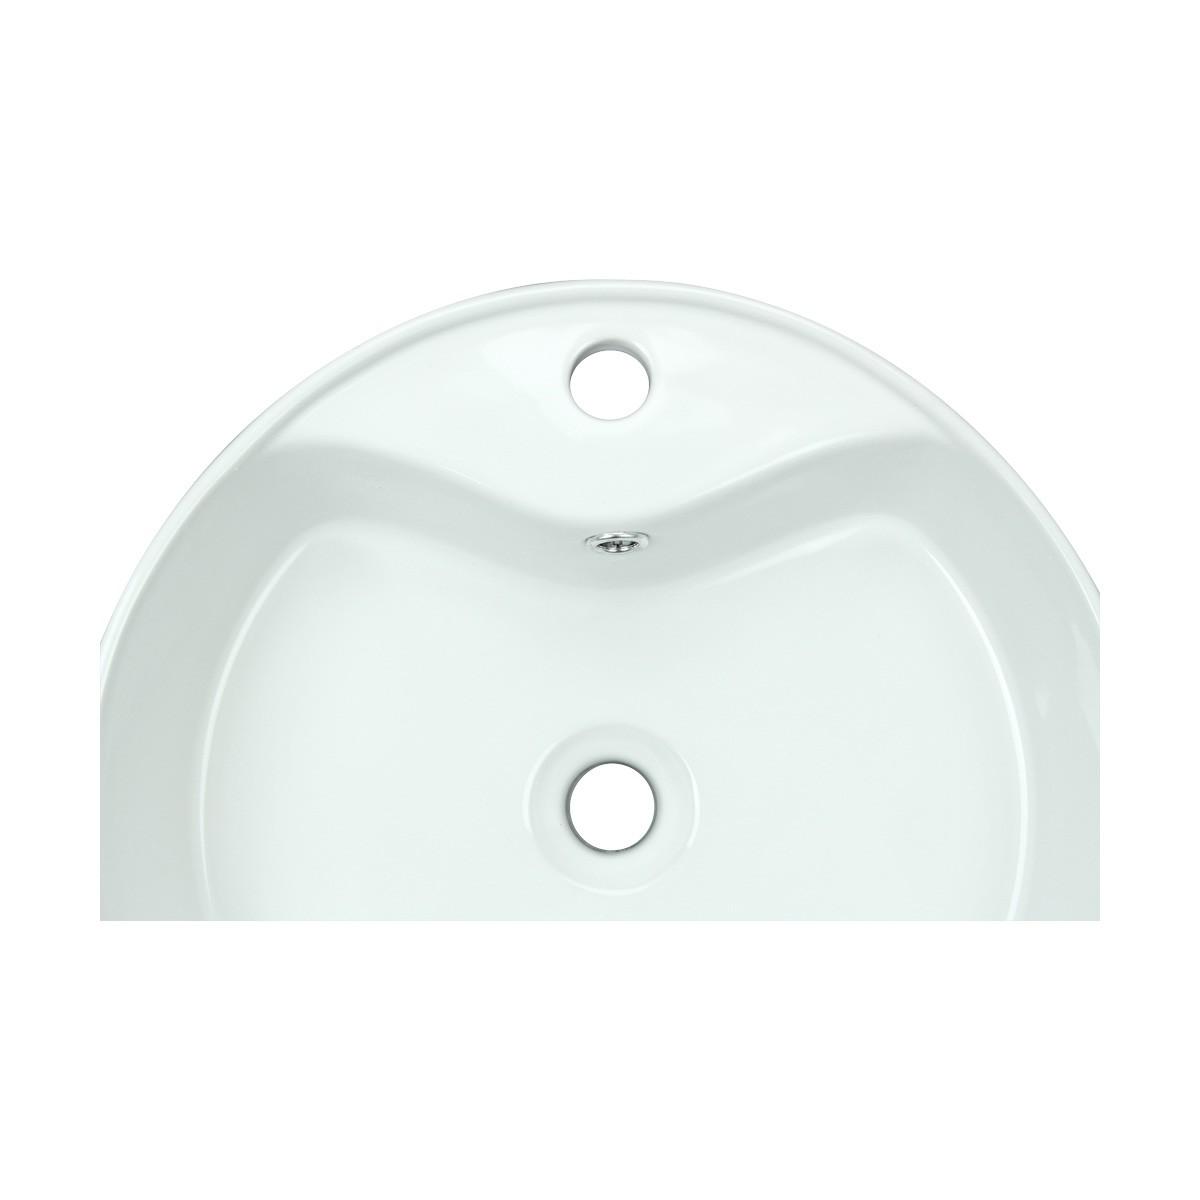 Bathroom Vessel Sink White Porcelain Prescott Faucet Hole bathroom vessel sinks Countertop vessel sink Bathroom Vessel Sink